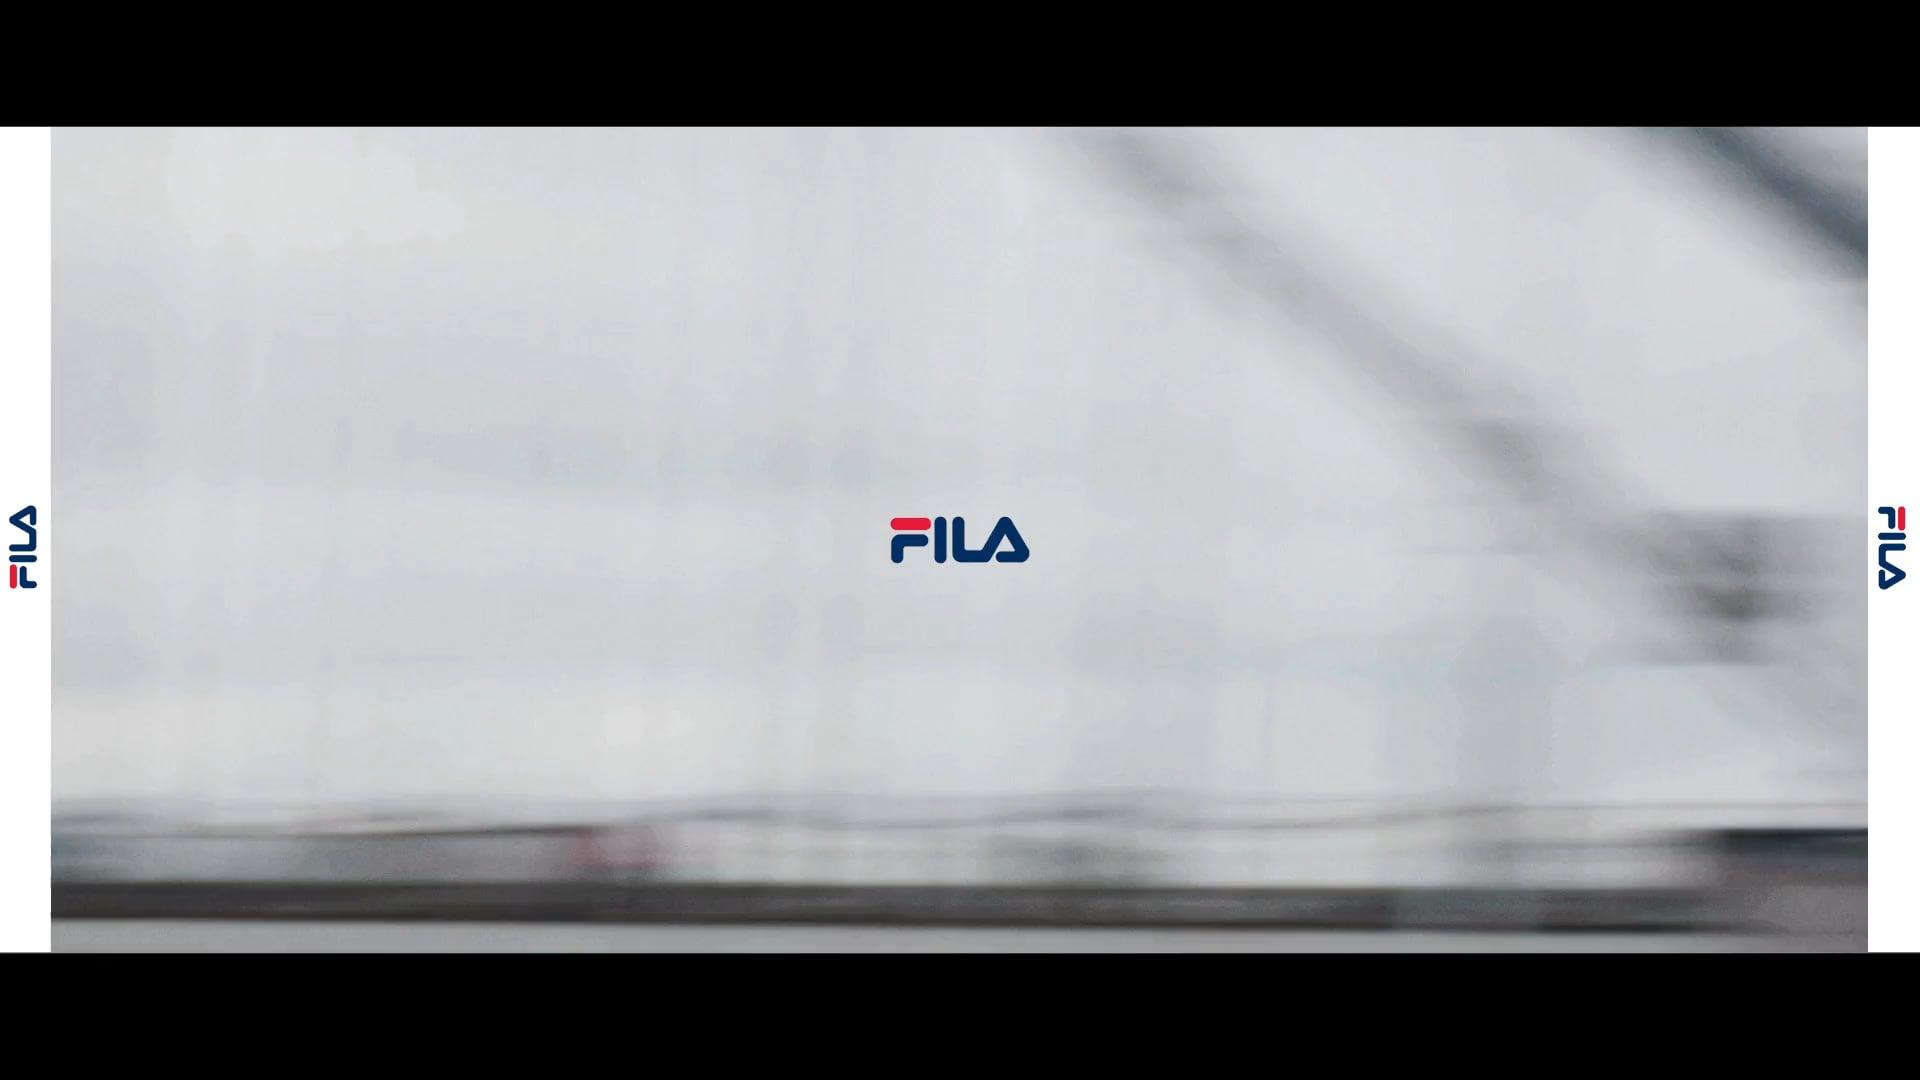 fila - disruptor